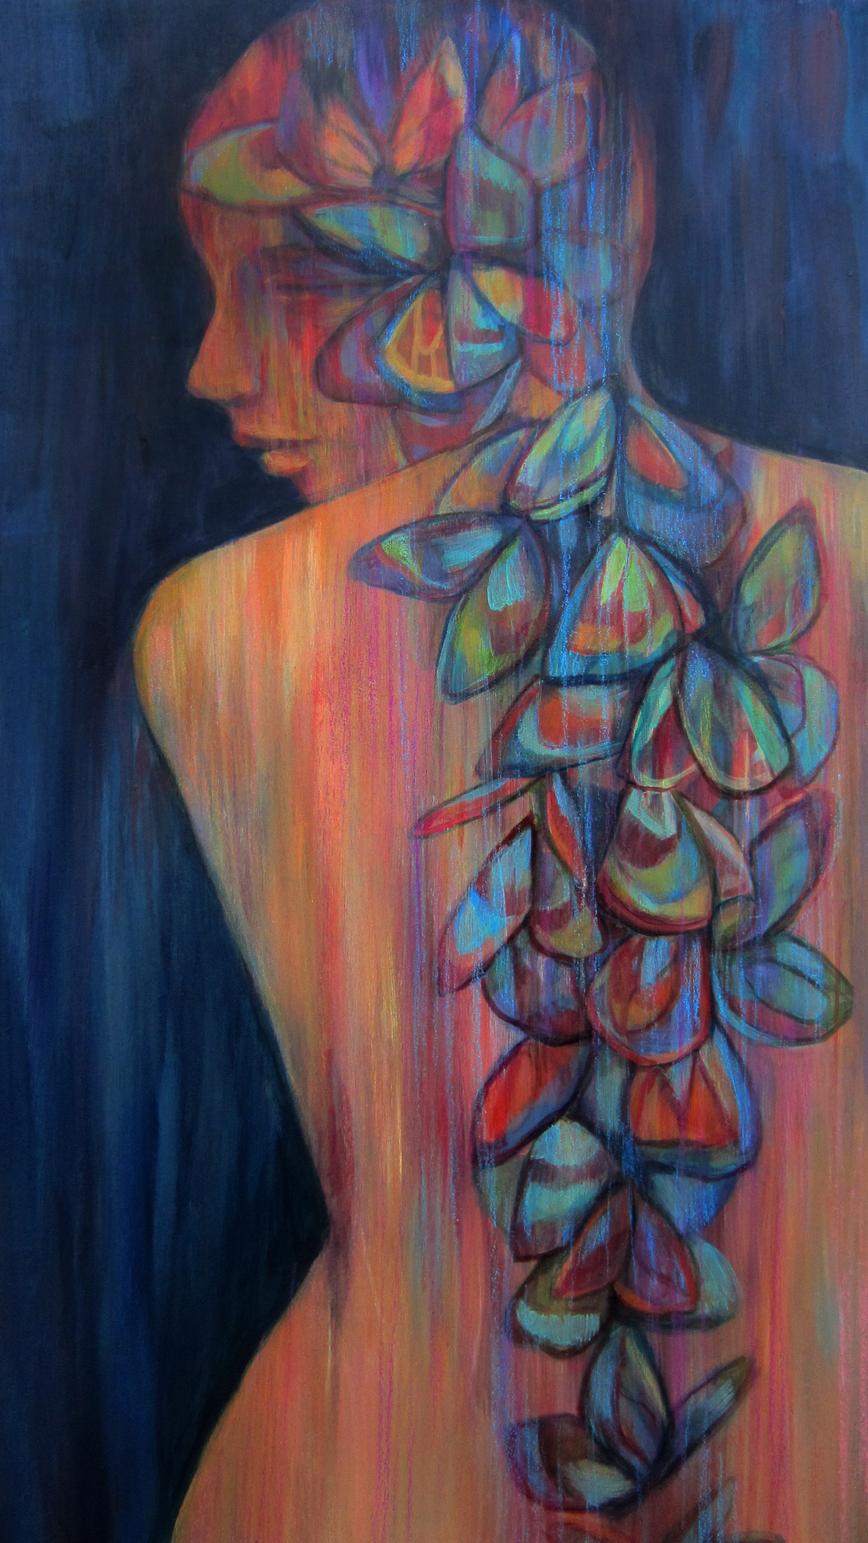 Backbone Series- Petals and Wings, #1. 15x30 in.